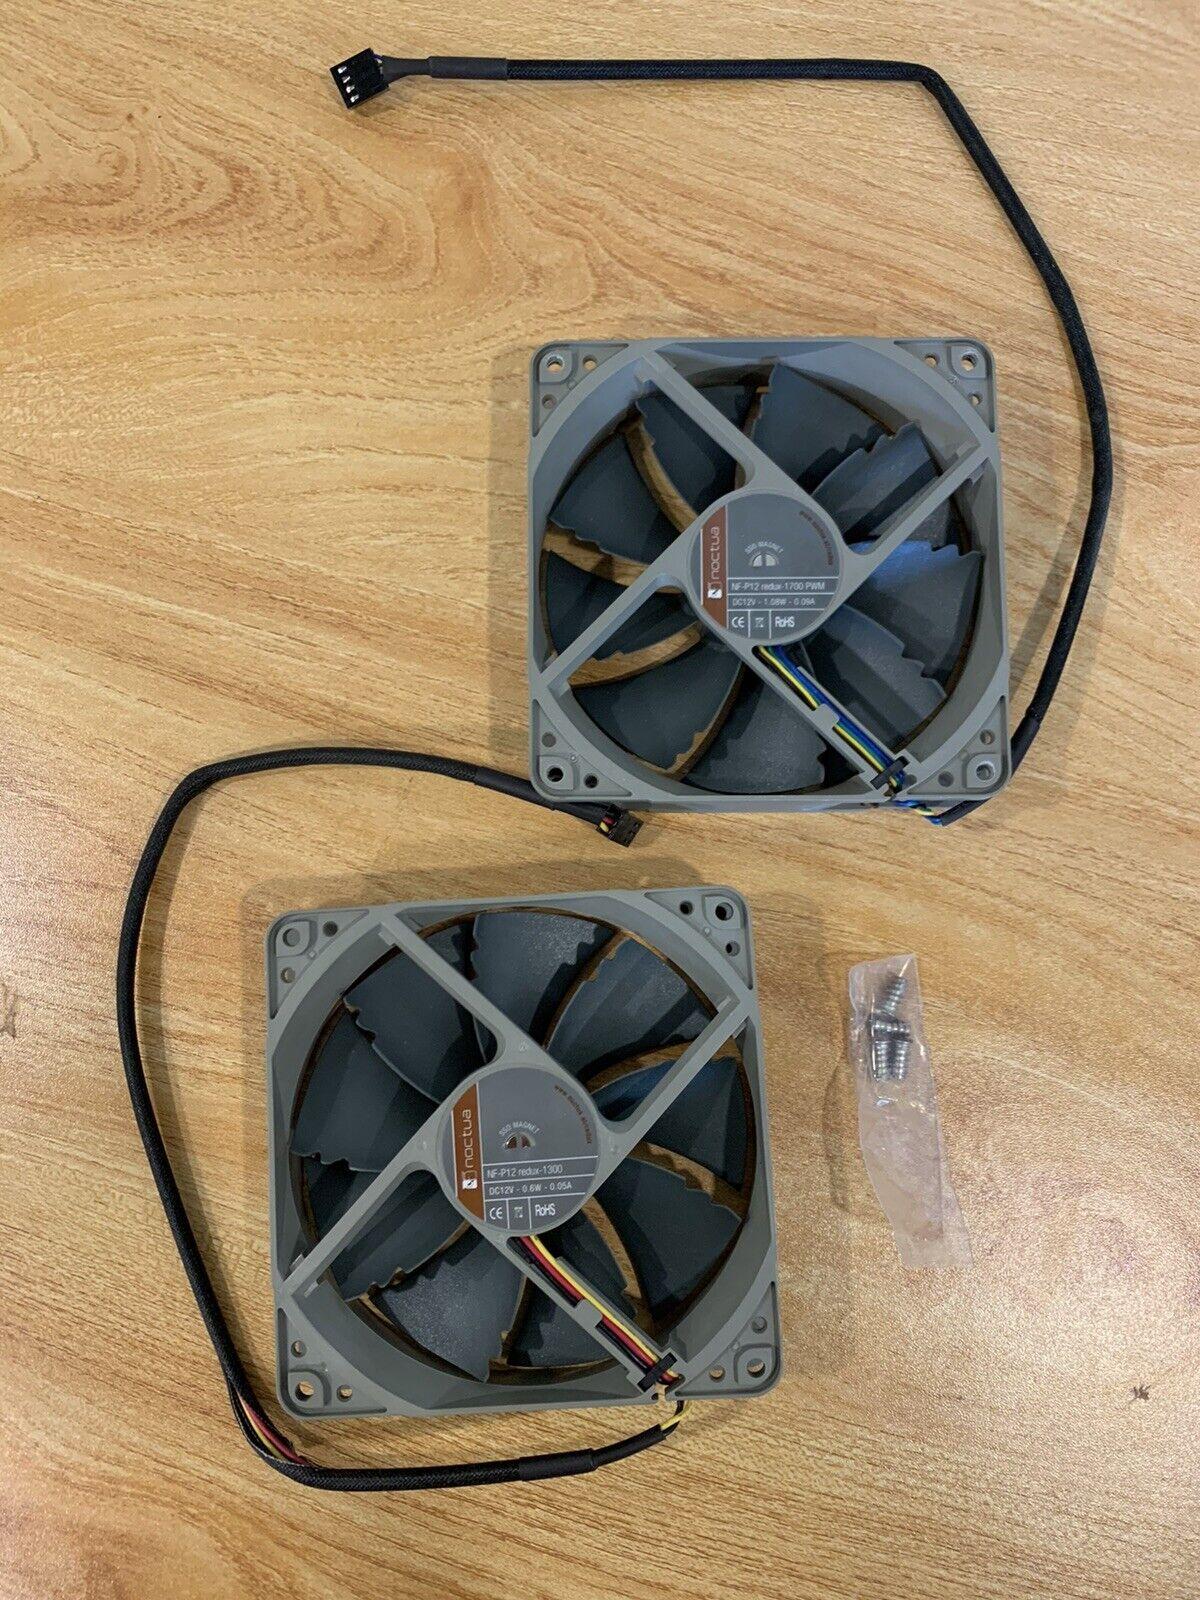 [Lot of 2] Noctua NF-P12 Redux-1300 Fan 3-Pin 1300 RPM 120mm